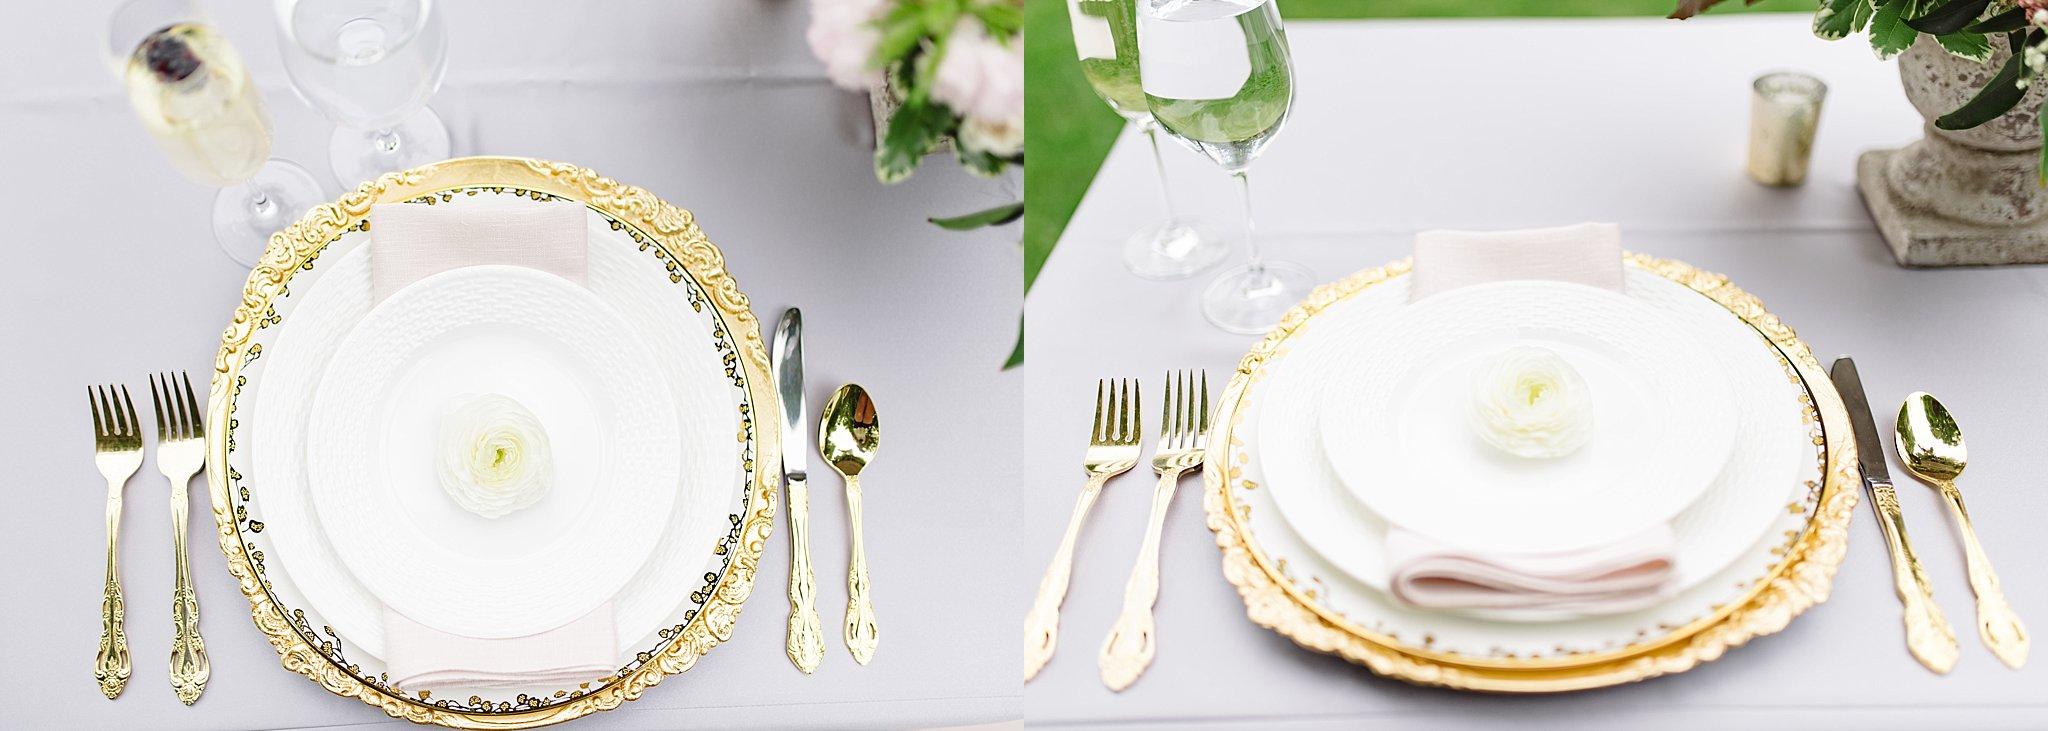 small weddings in new england.jpg